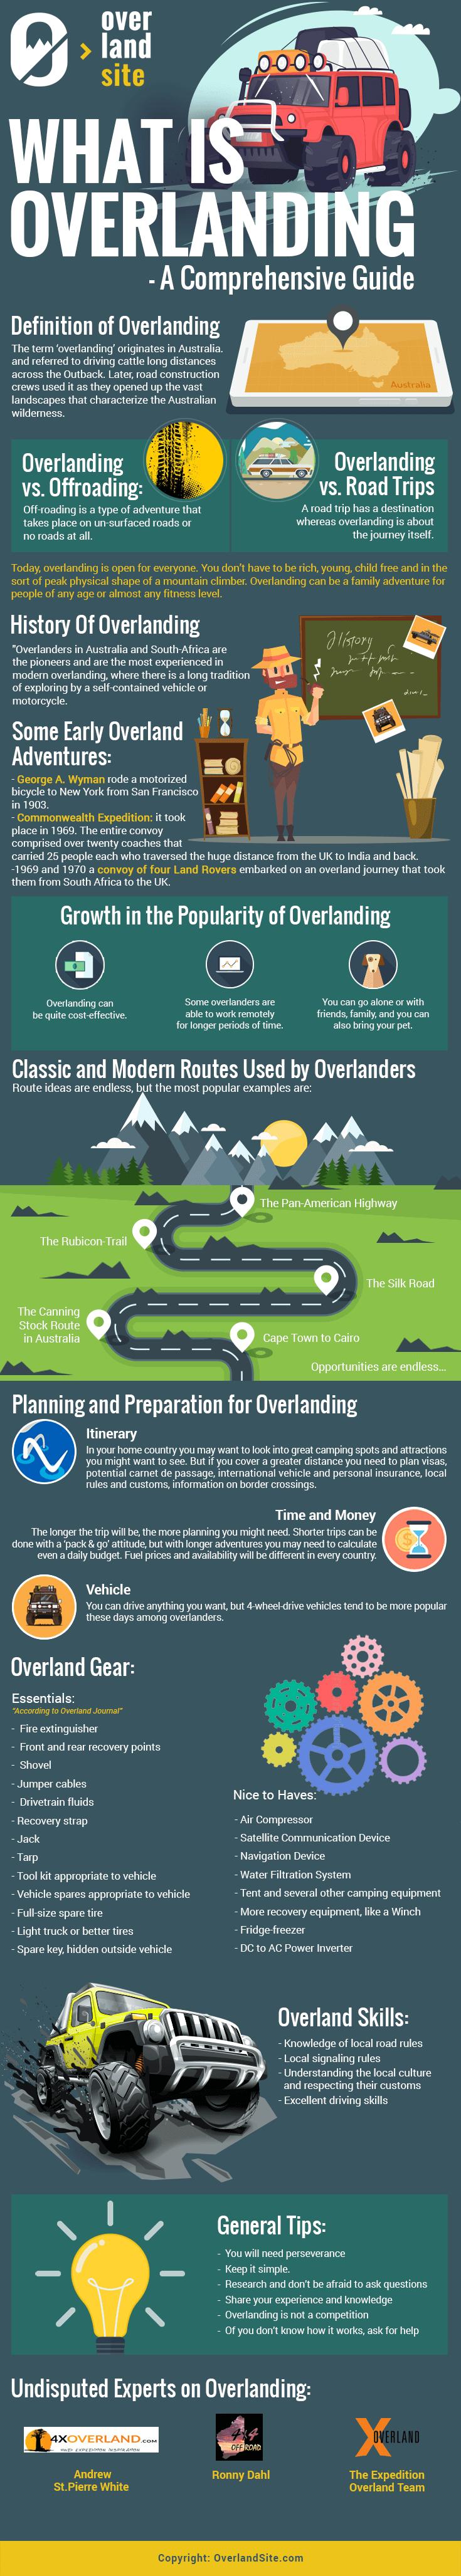 What-Is-Overlanding